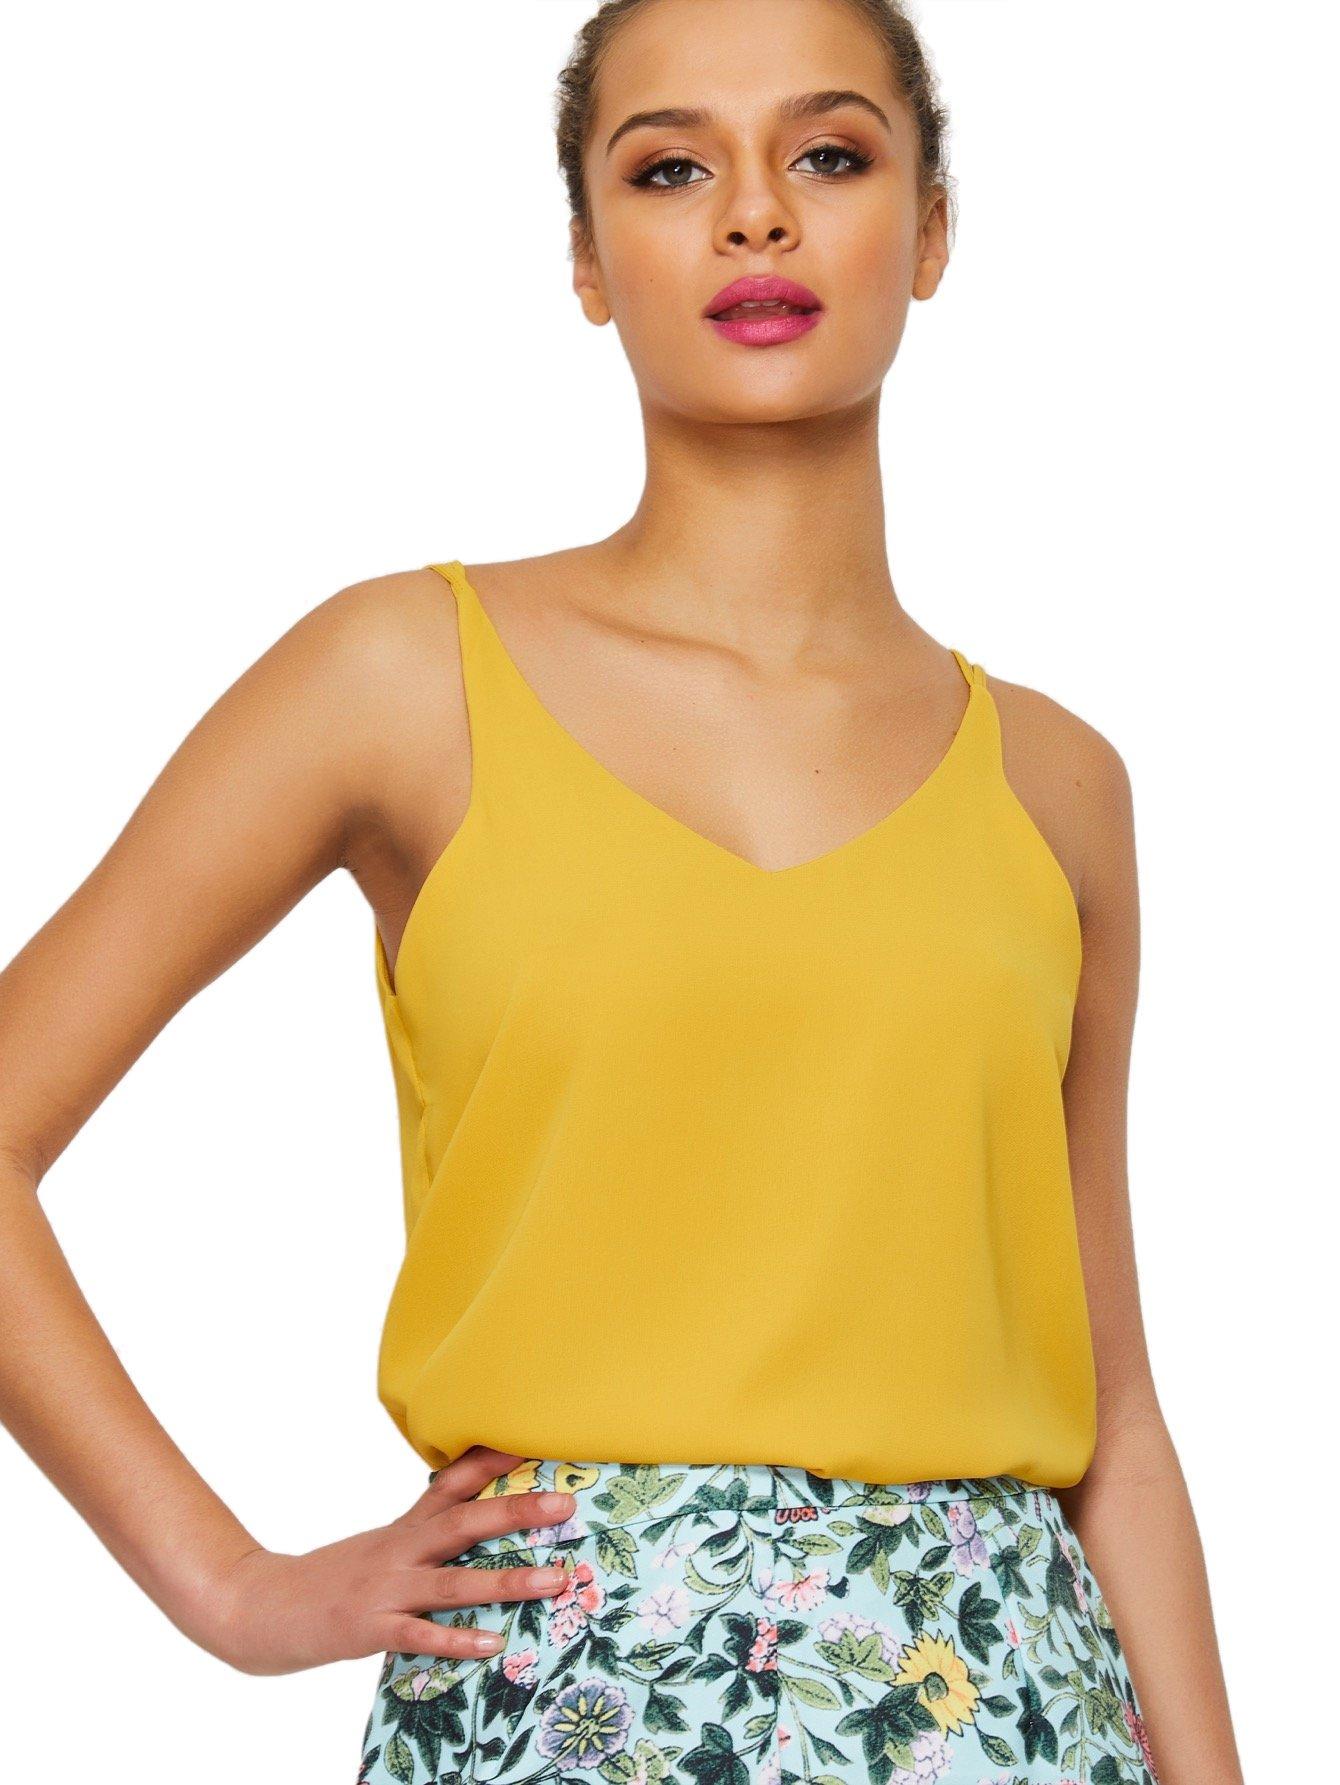 Verdusa Women's Sleeveless V Neck Strappy Cami Top Vests Camisole Mustard L